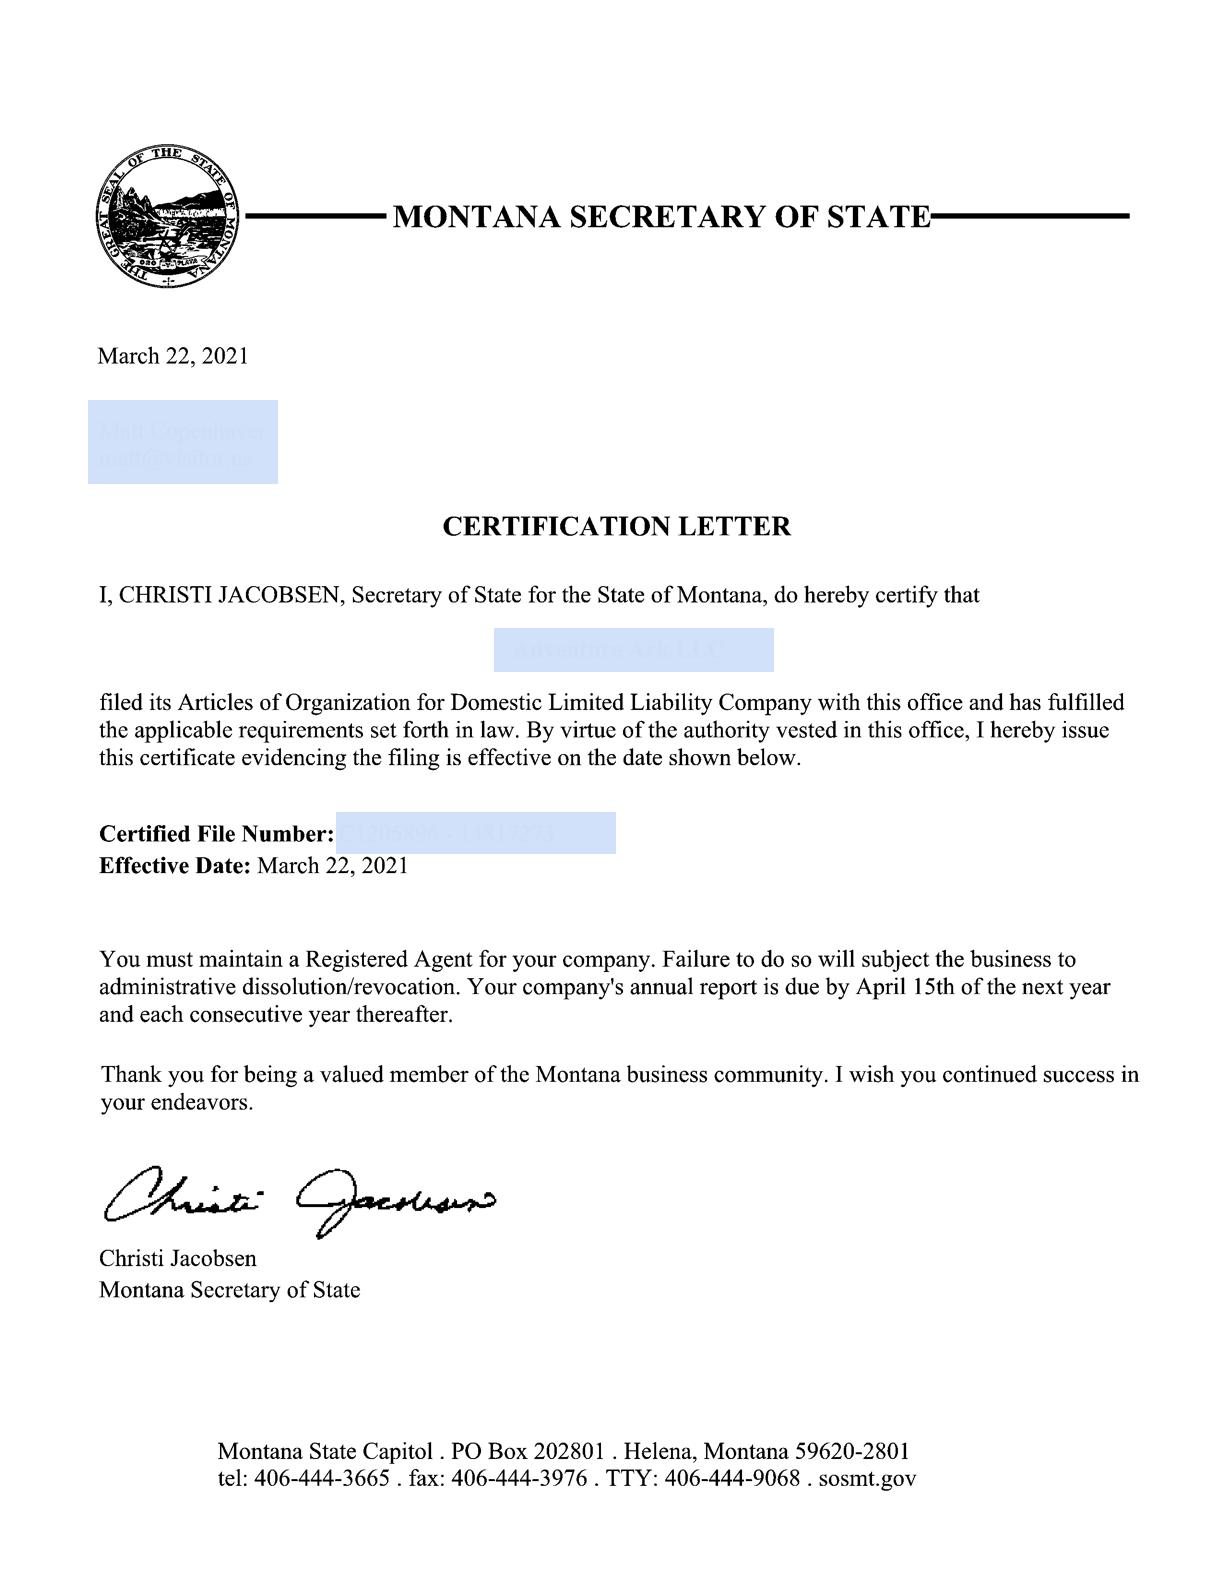 Montana LLC Certification Letter Example